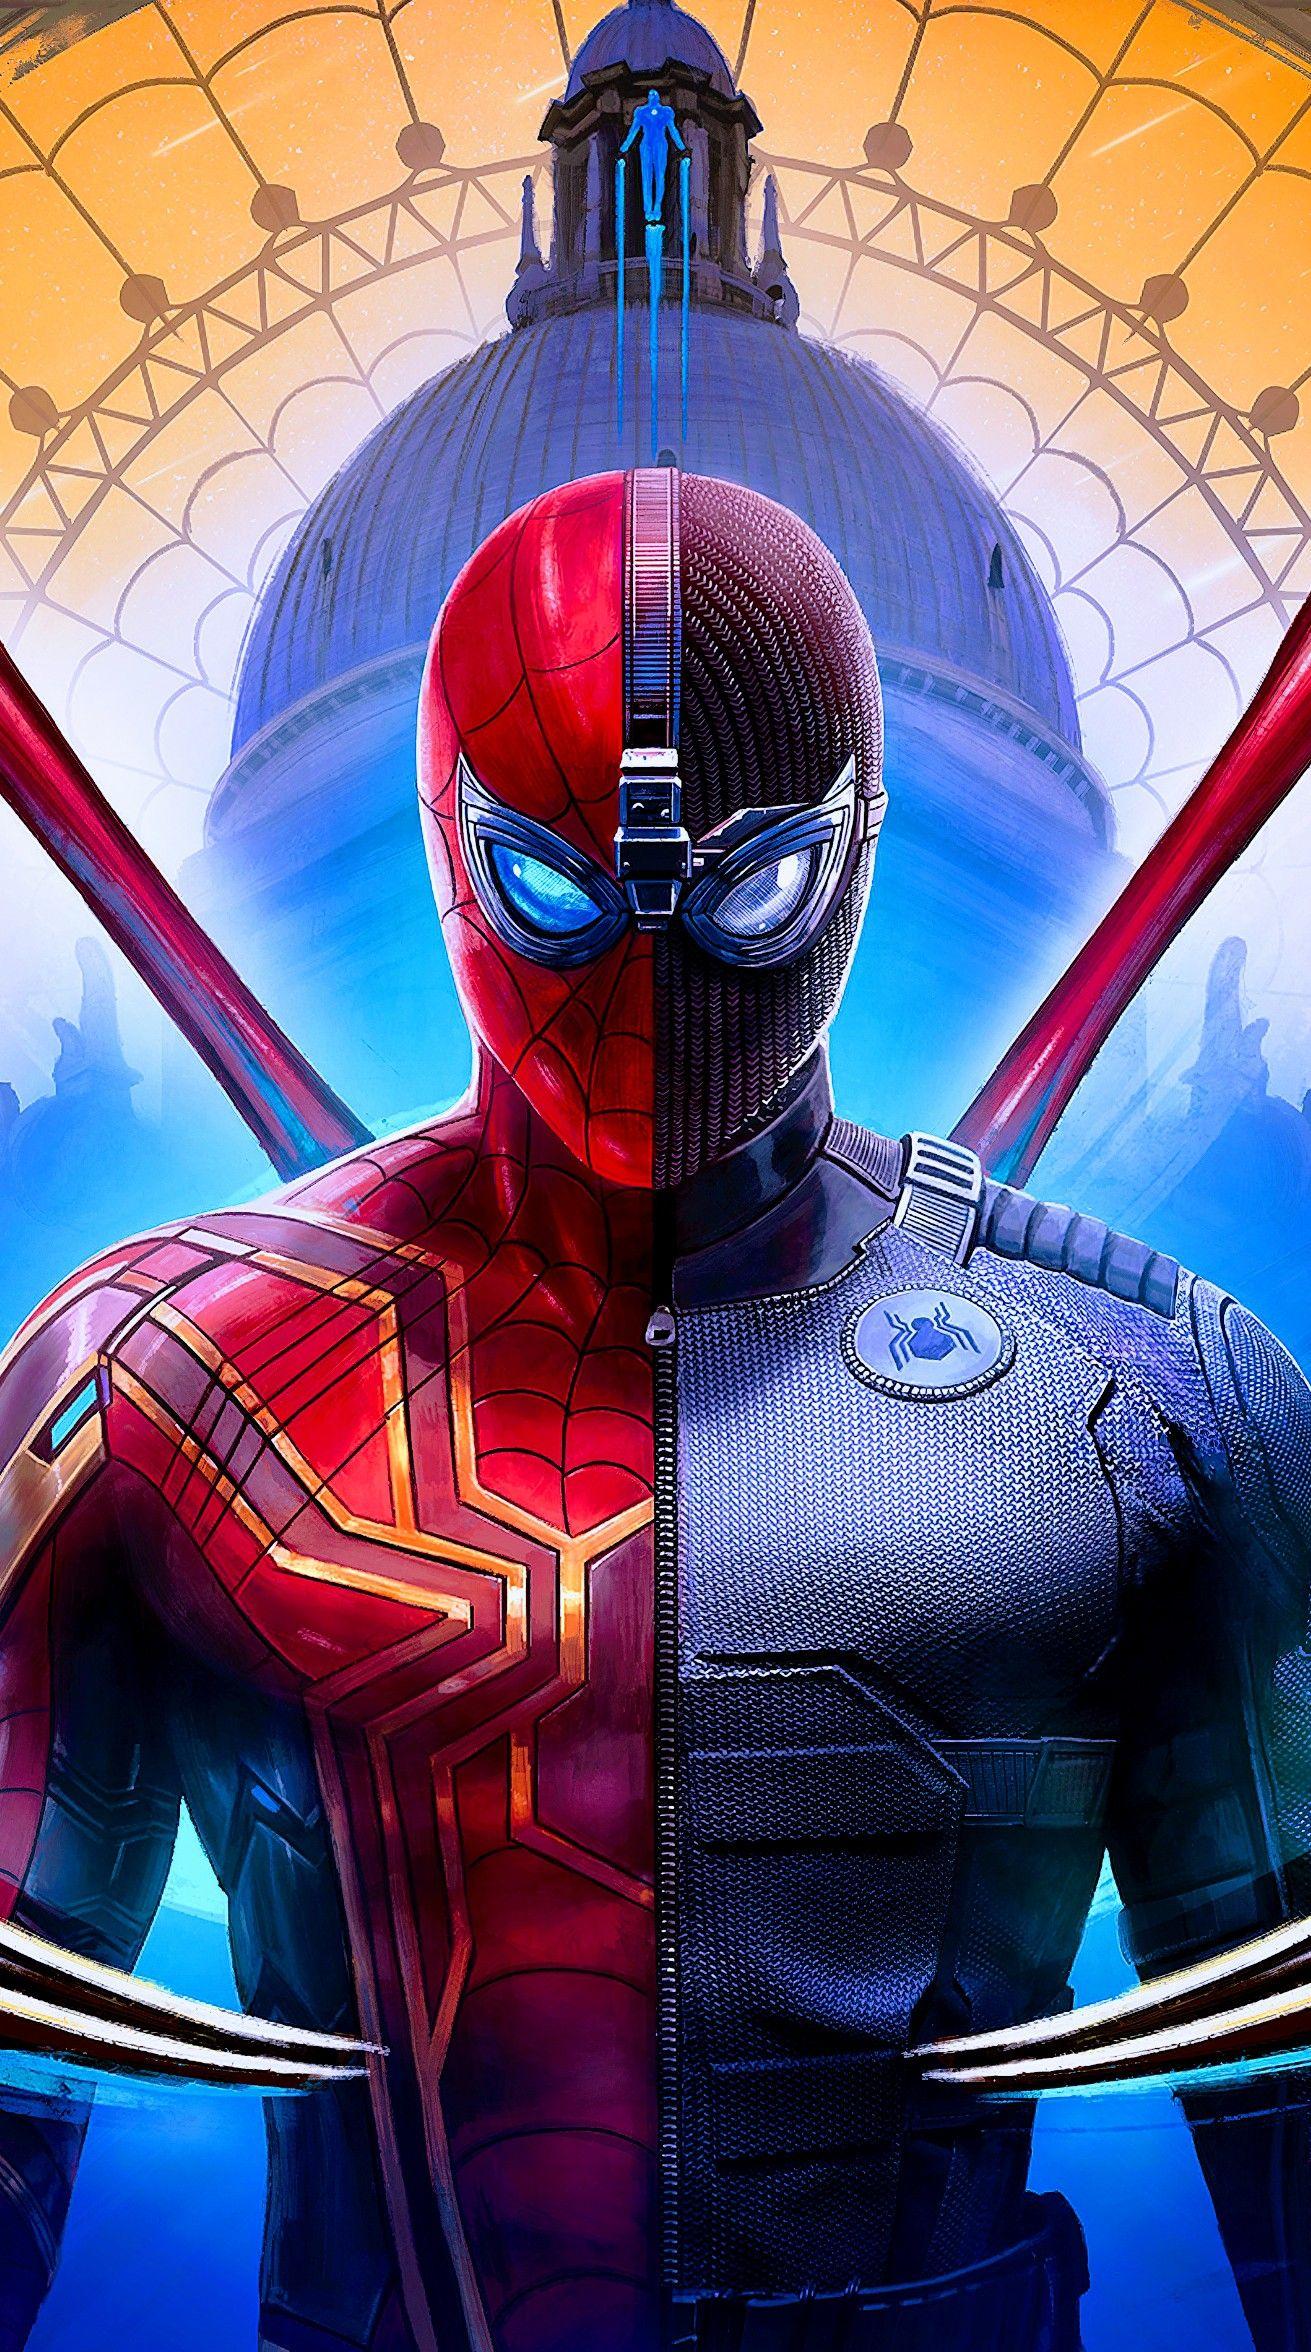 Iron Spider Man Dibujos Marvel Spiderman Personajes Arte De Marvel